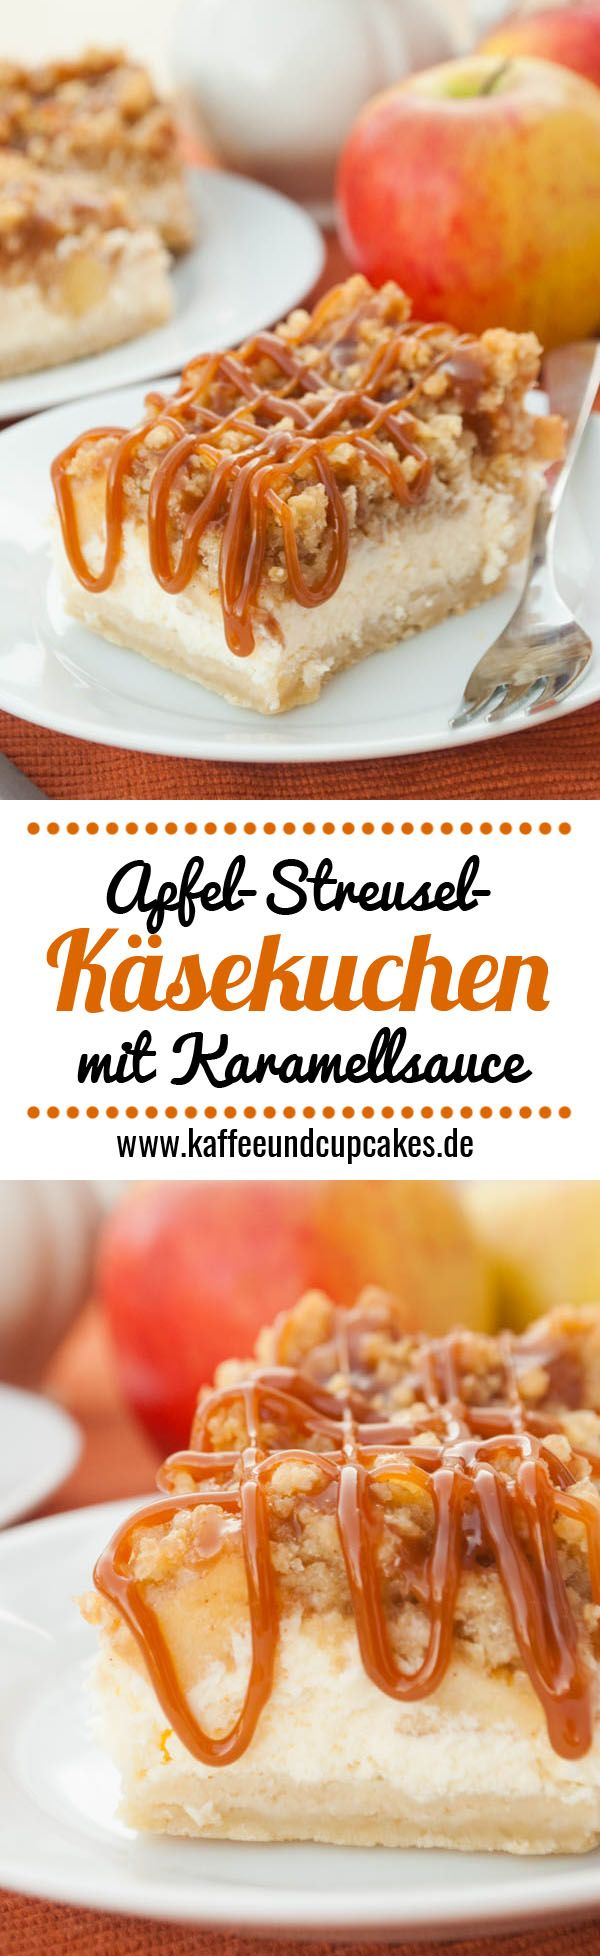 Apfel-Streusel-Käsekuchen mit Karamellsauce                                                                                                                                                      Mehr